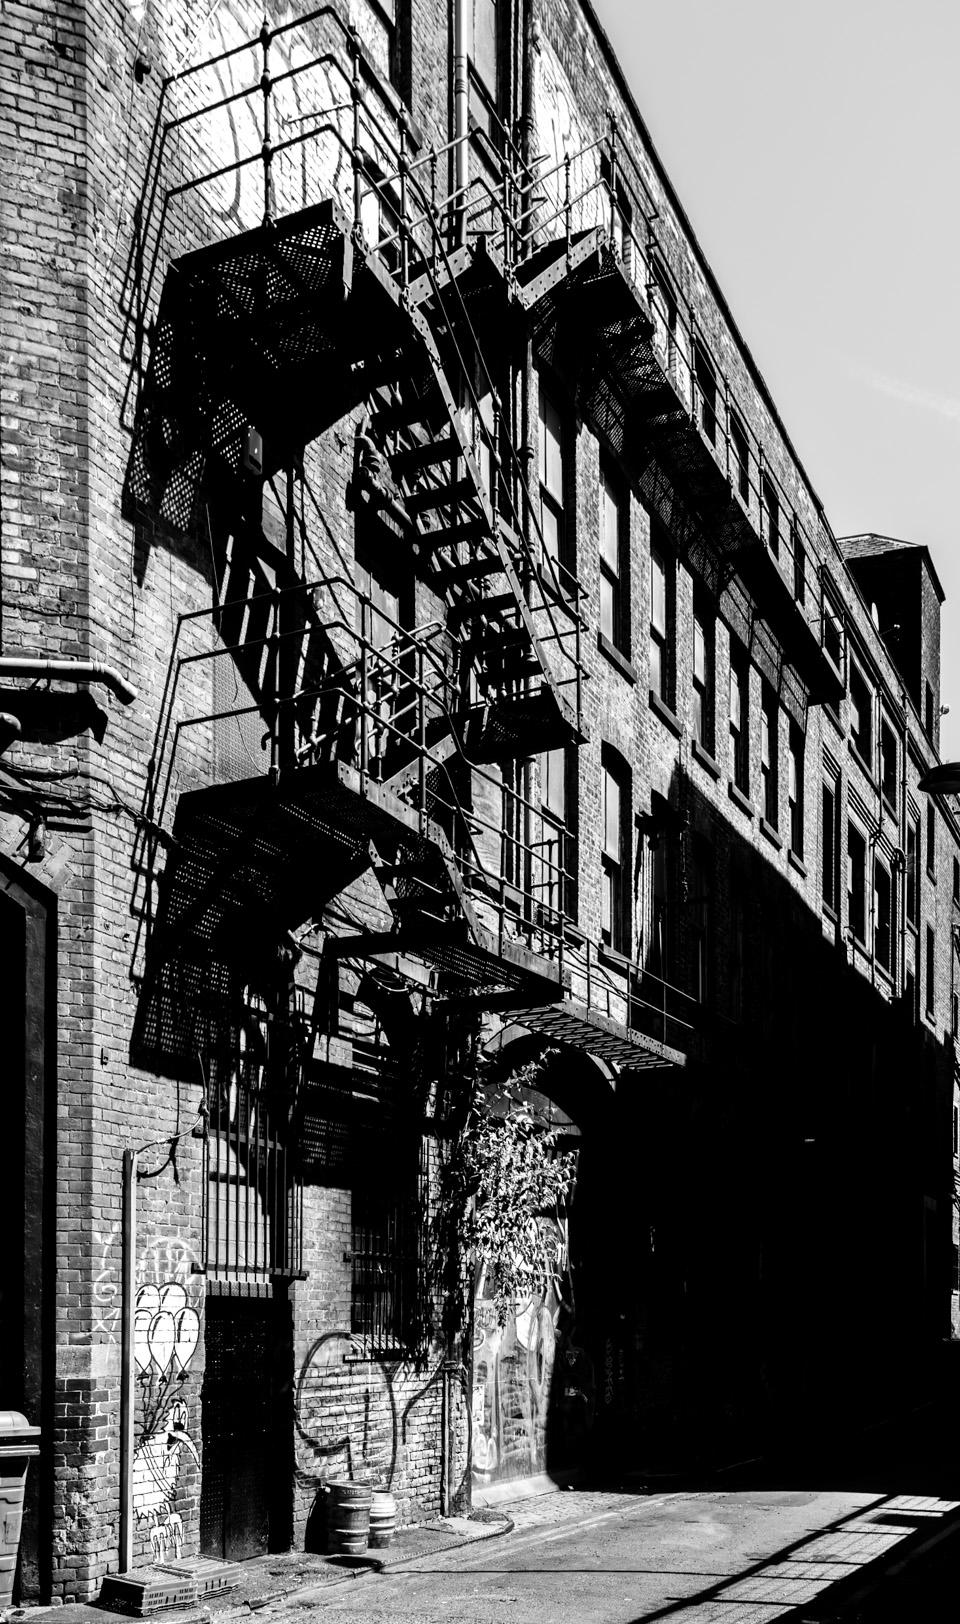 Northern Quarter, Manchester